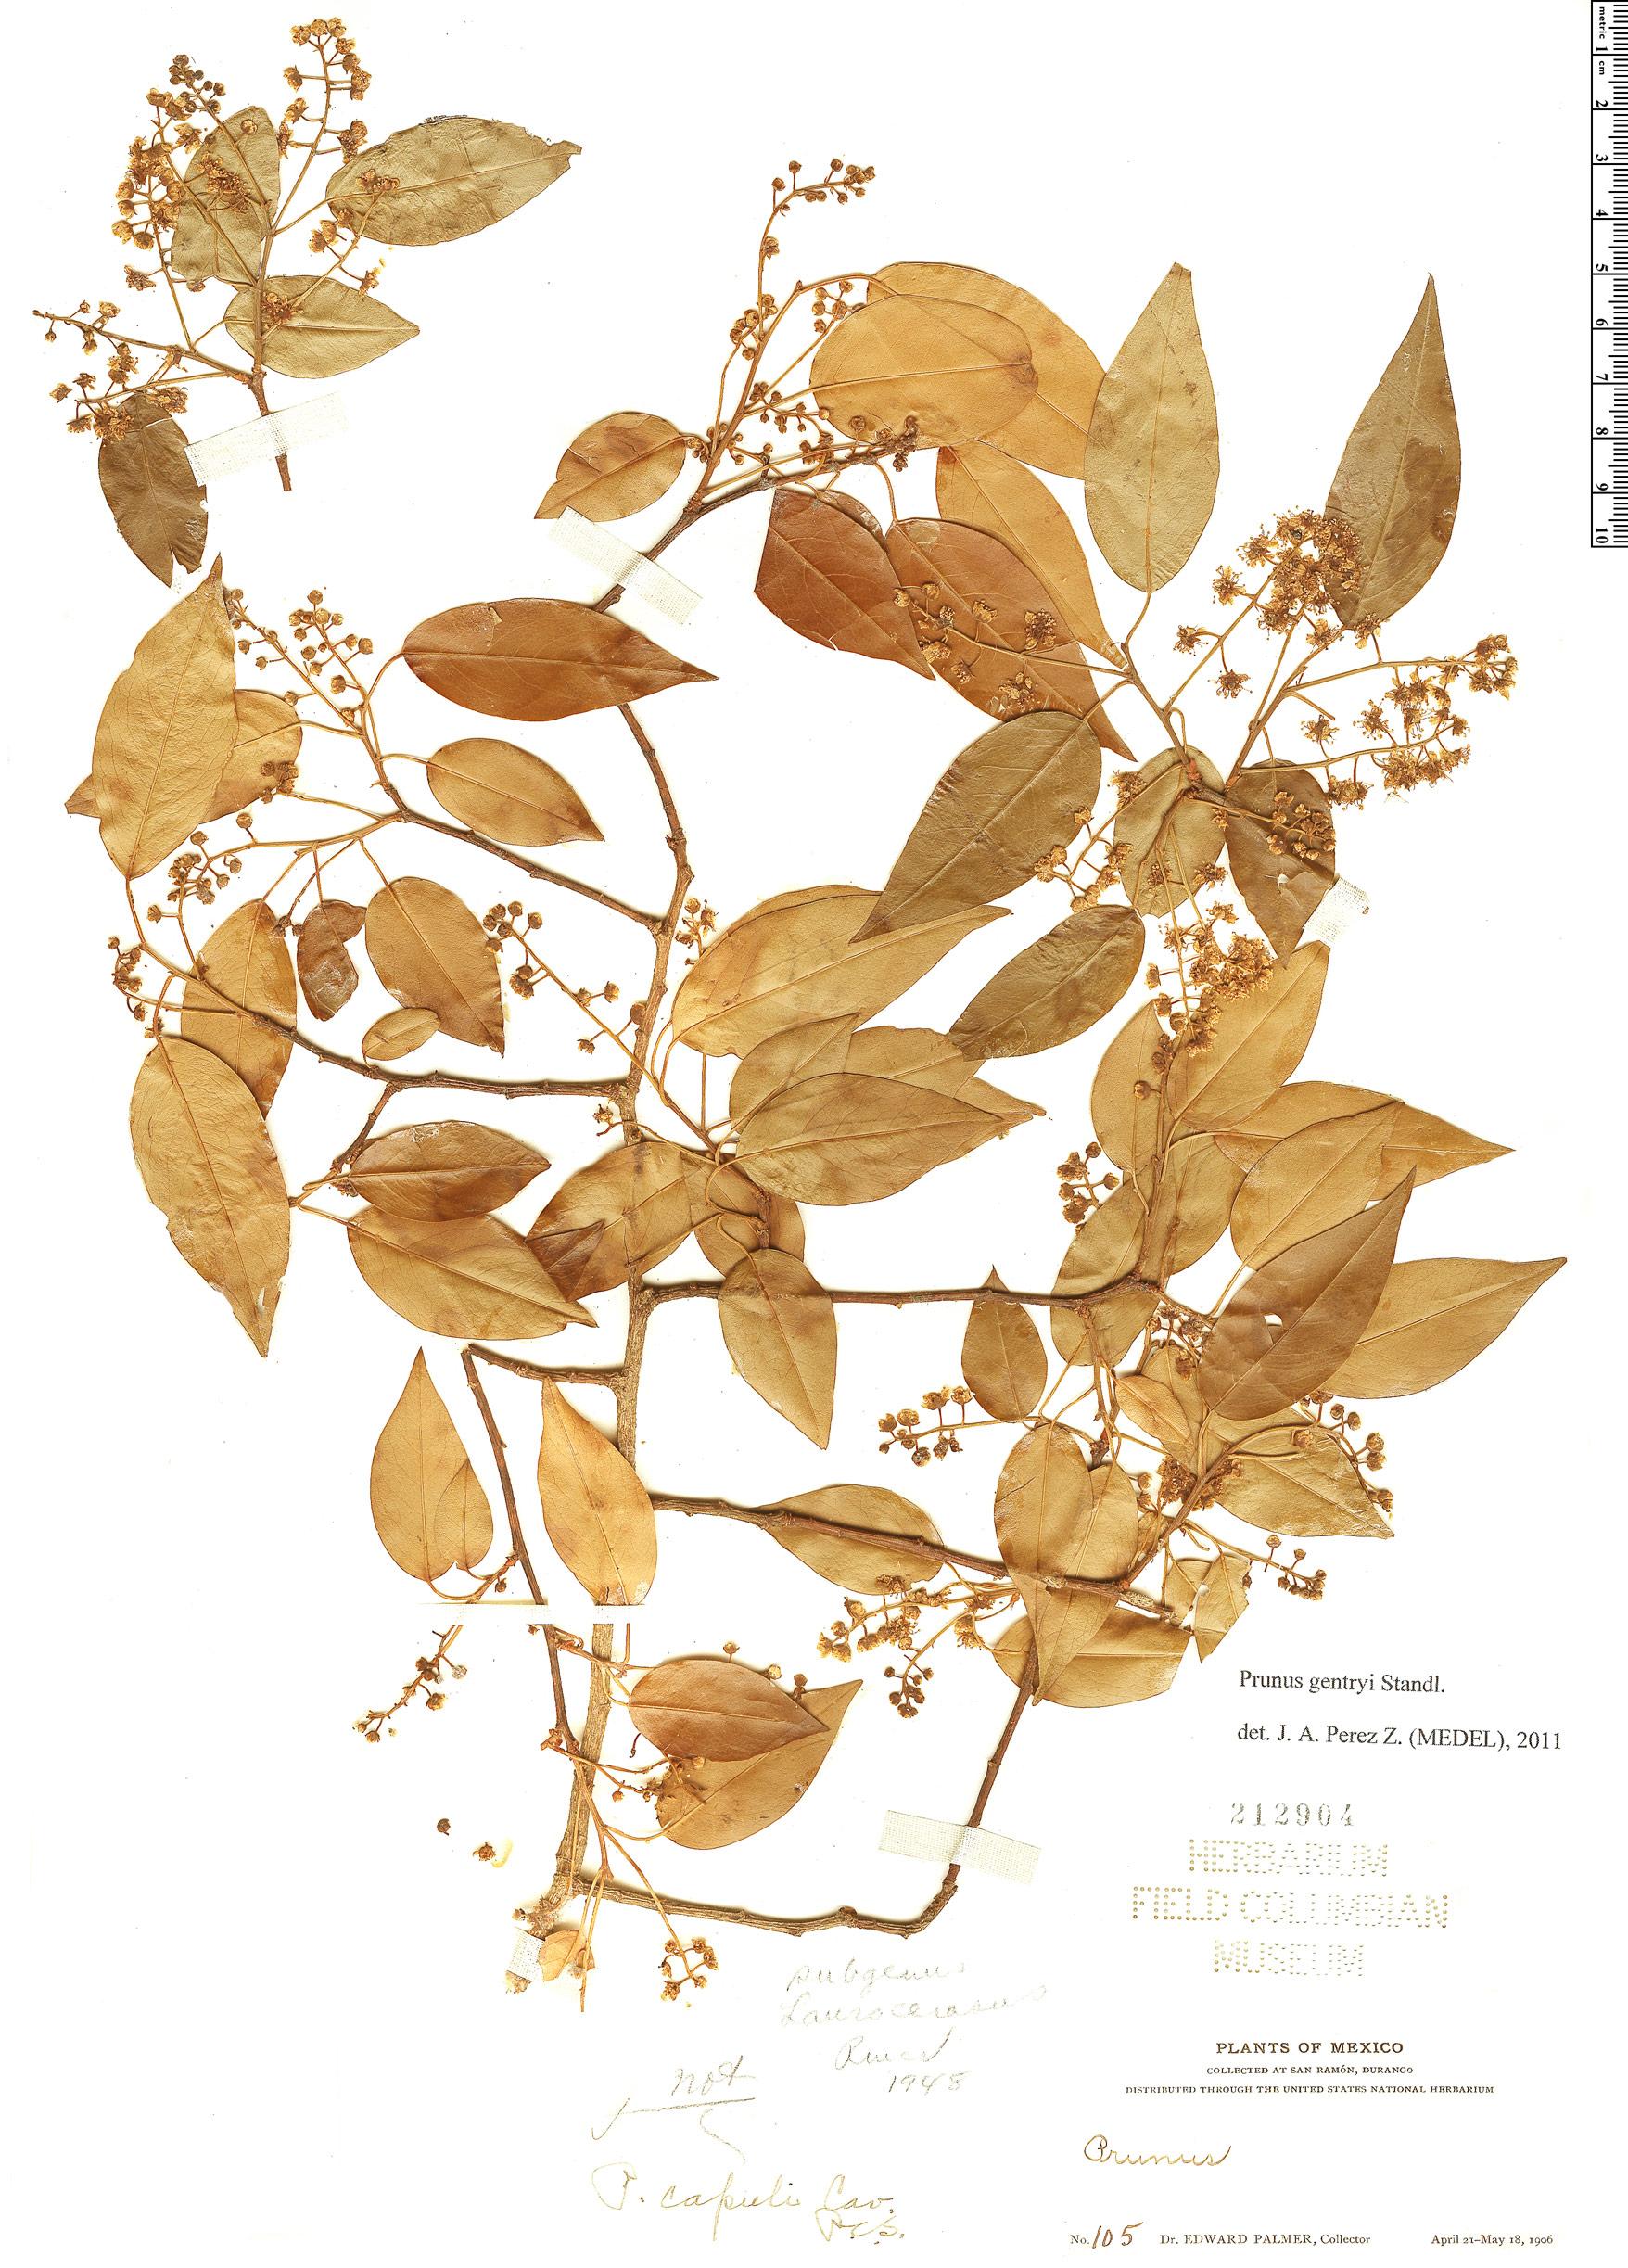 Specimen: Prunus gentryi